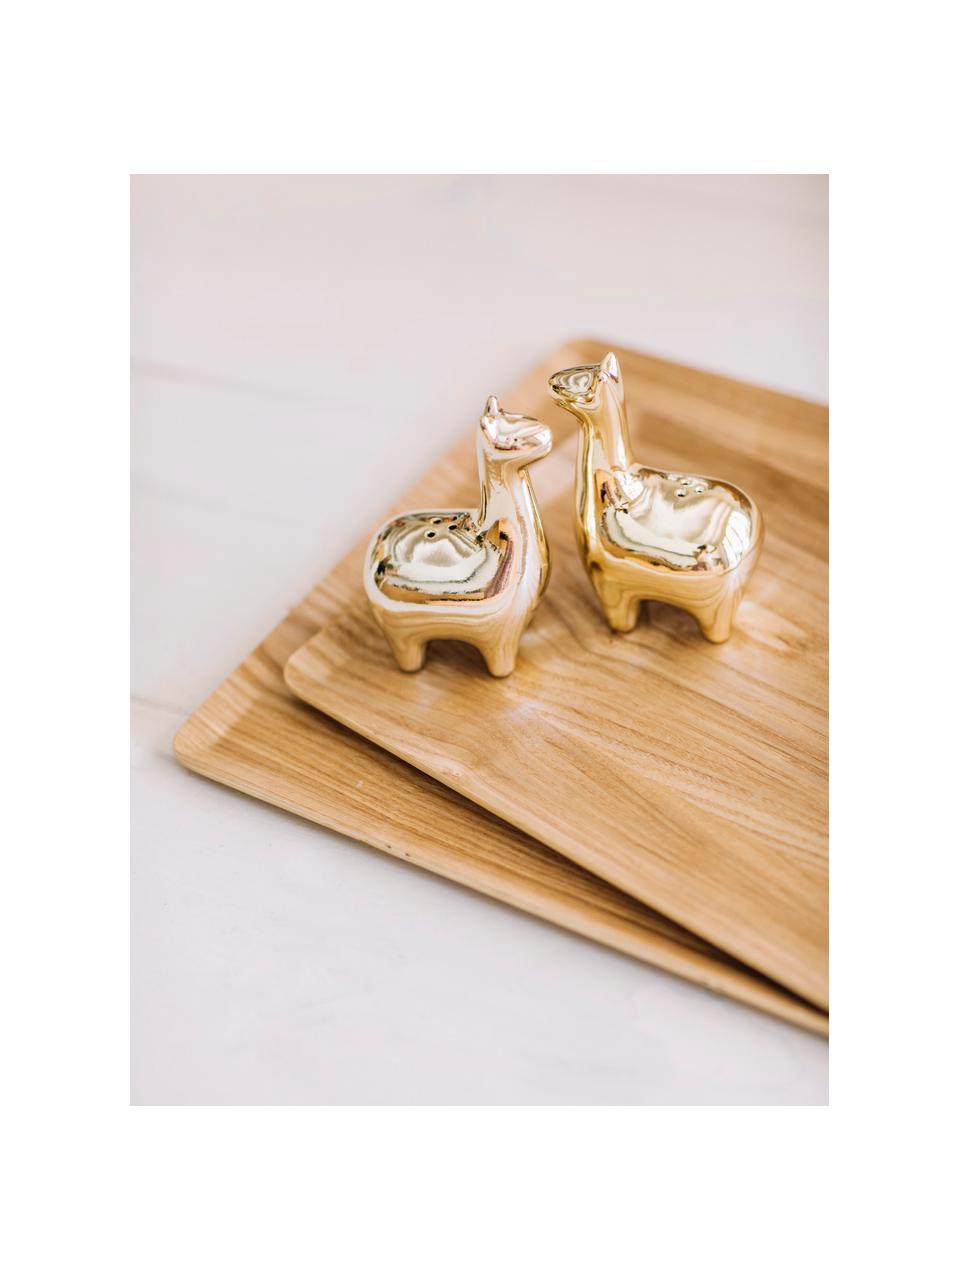 Zout- en peperstrooierset Lamas, 2-delig, Keramiek, Messingkleurig, 5 x 9 cm